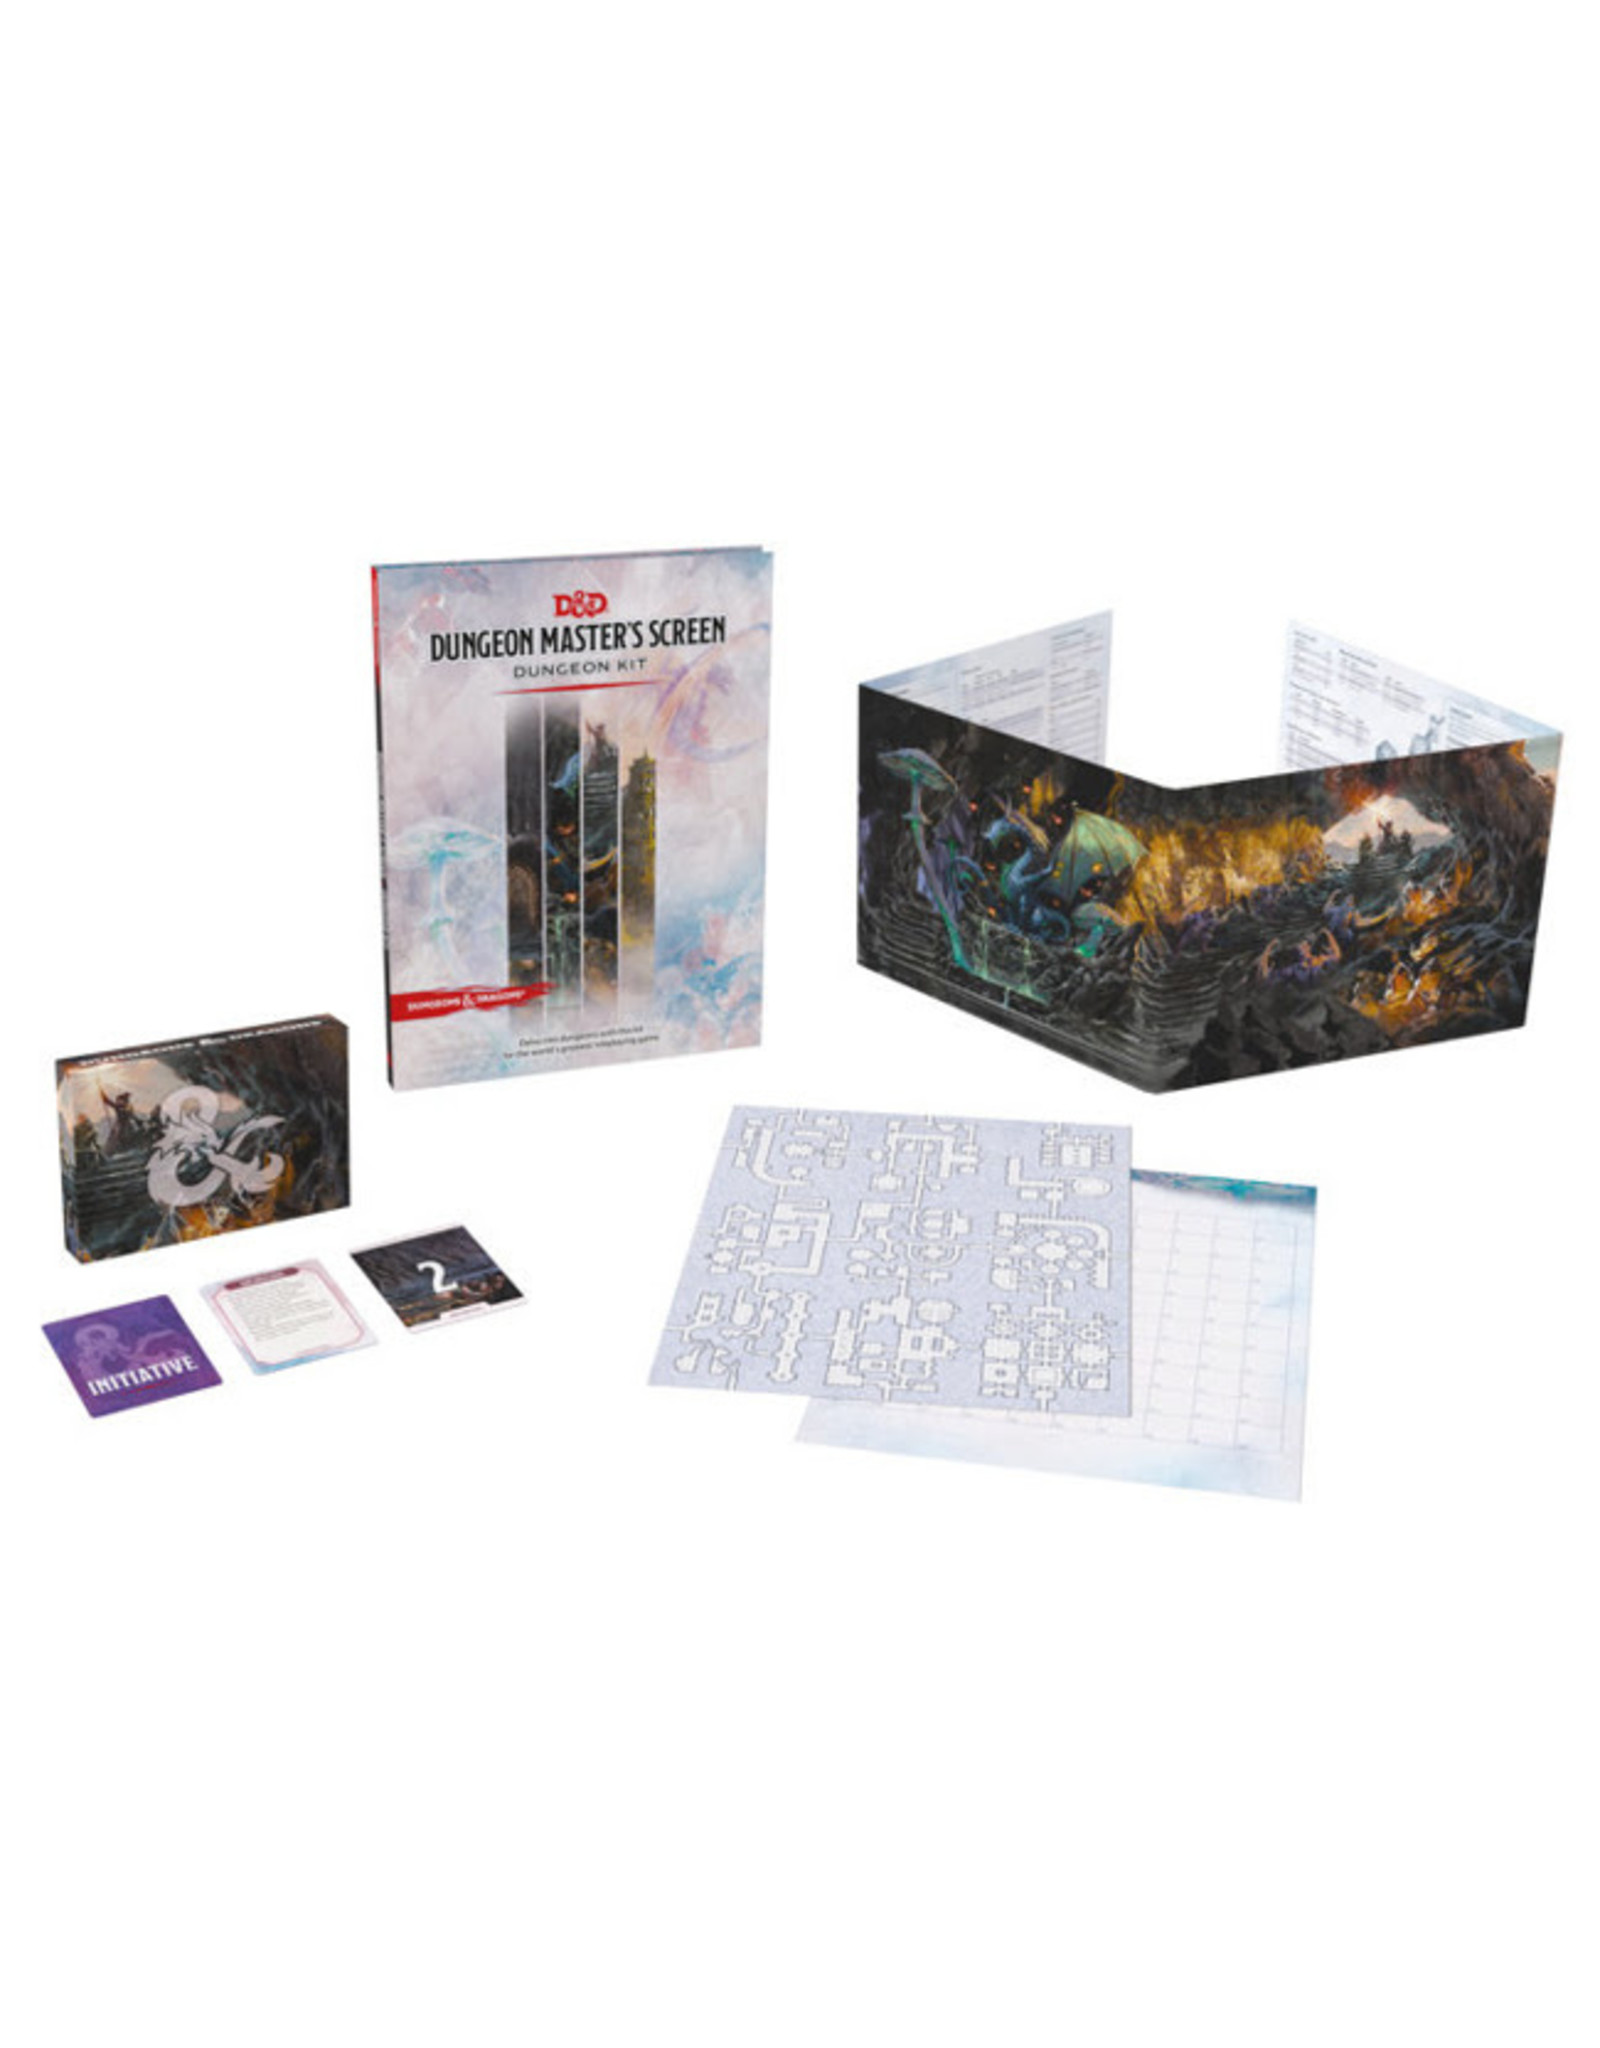 Dungeons & Dragons D&D 5E: DM's Screen Dungeon Kit (Pre Order)